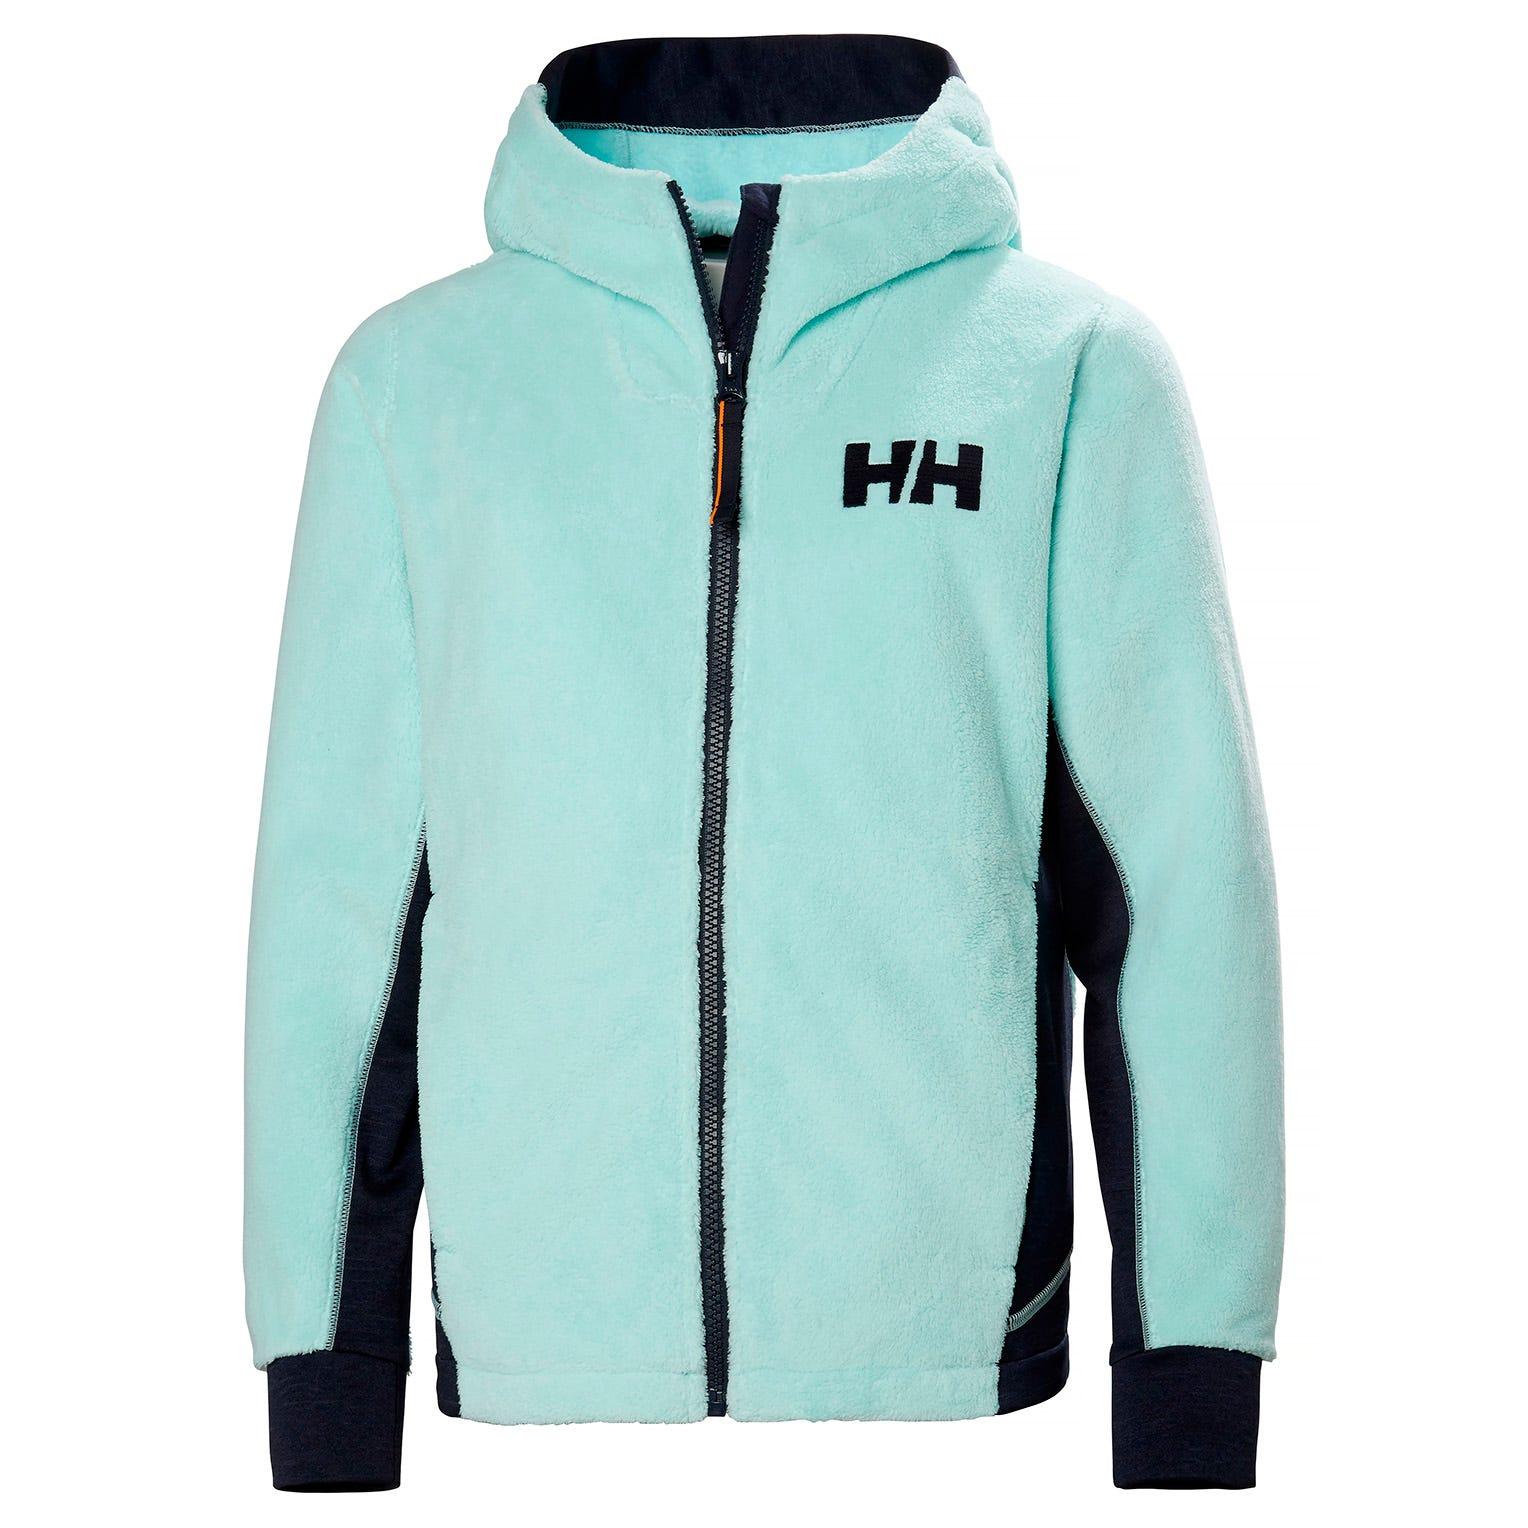 Helly Hansen Junior Chill Fz Hoodie Kids Fleece Blue 152/12